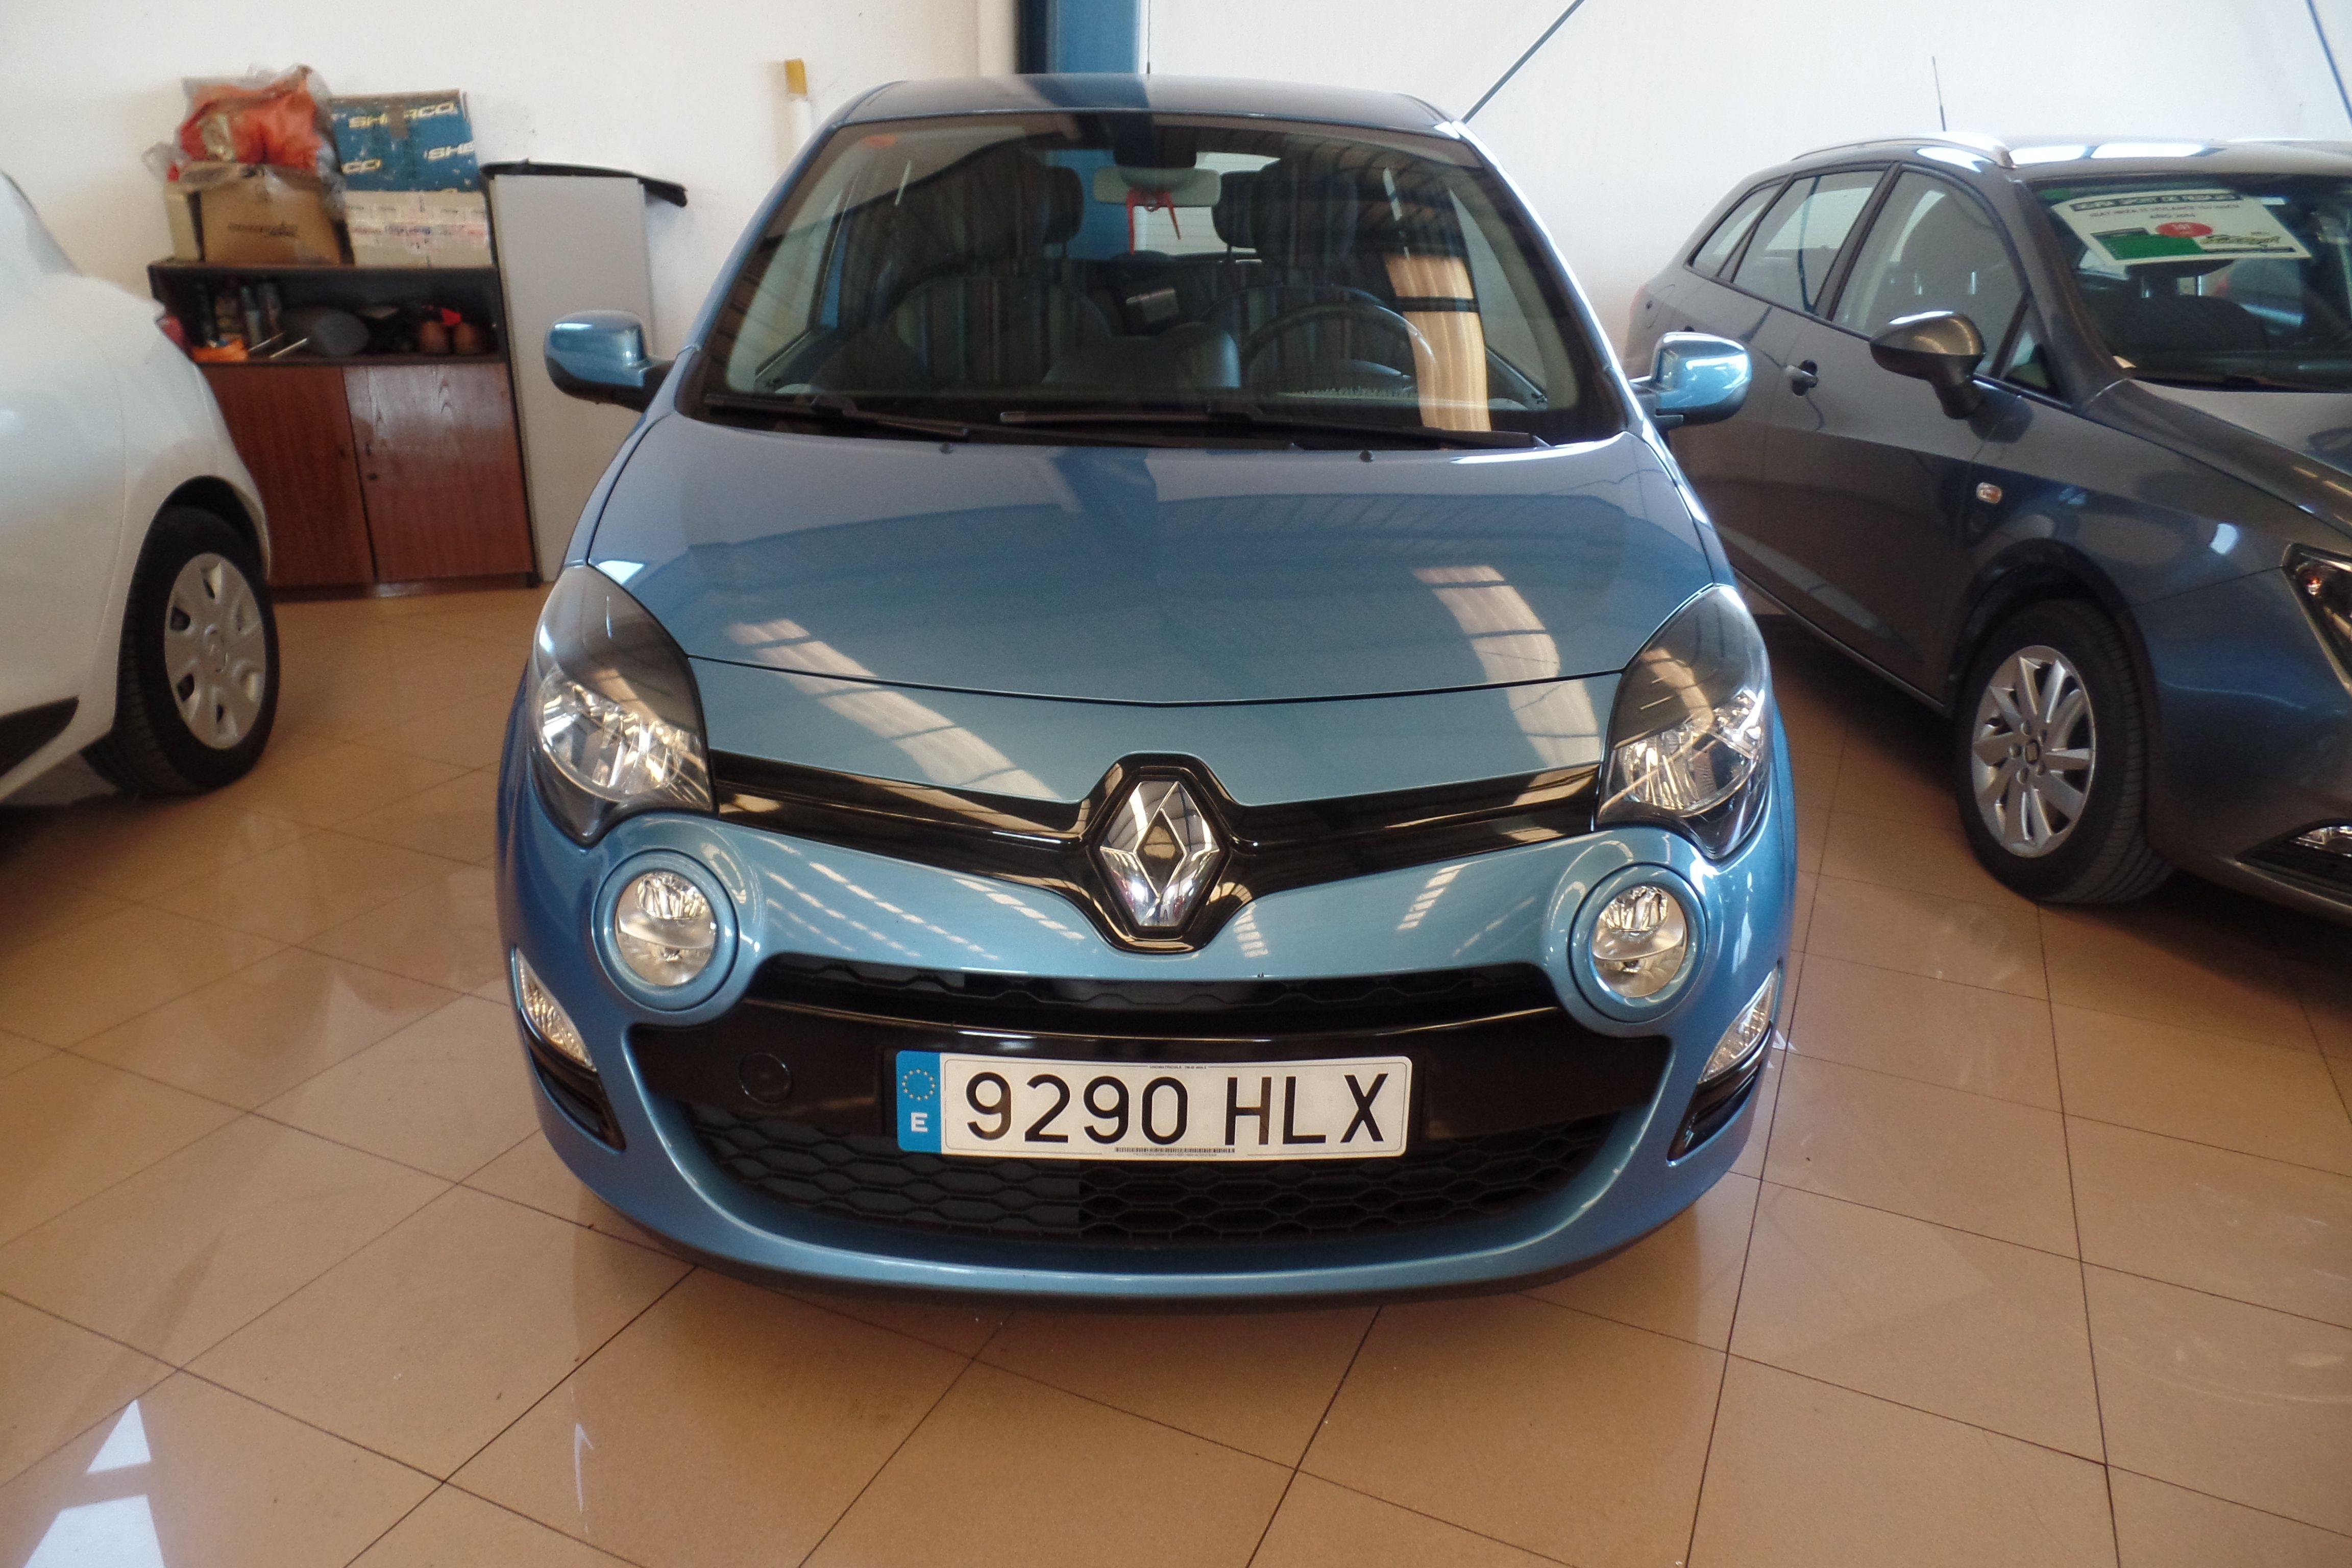 RENAULT Twingo Emotion dCi 85 eco2 (9290-HLX): Servicios Peugeot de Senra Sport